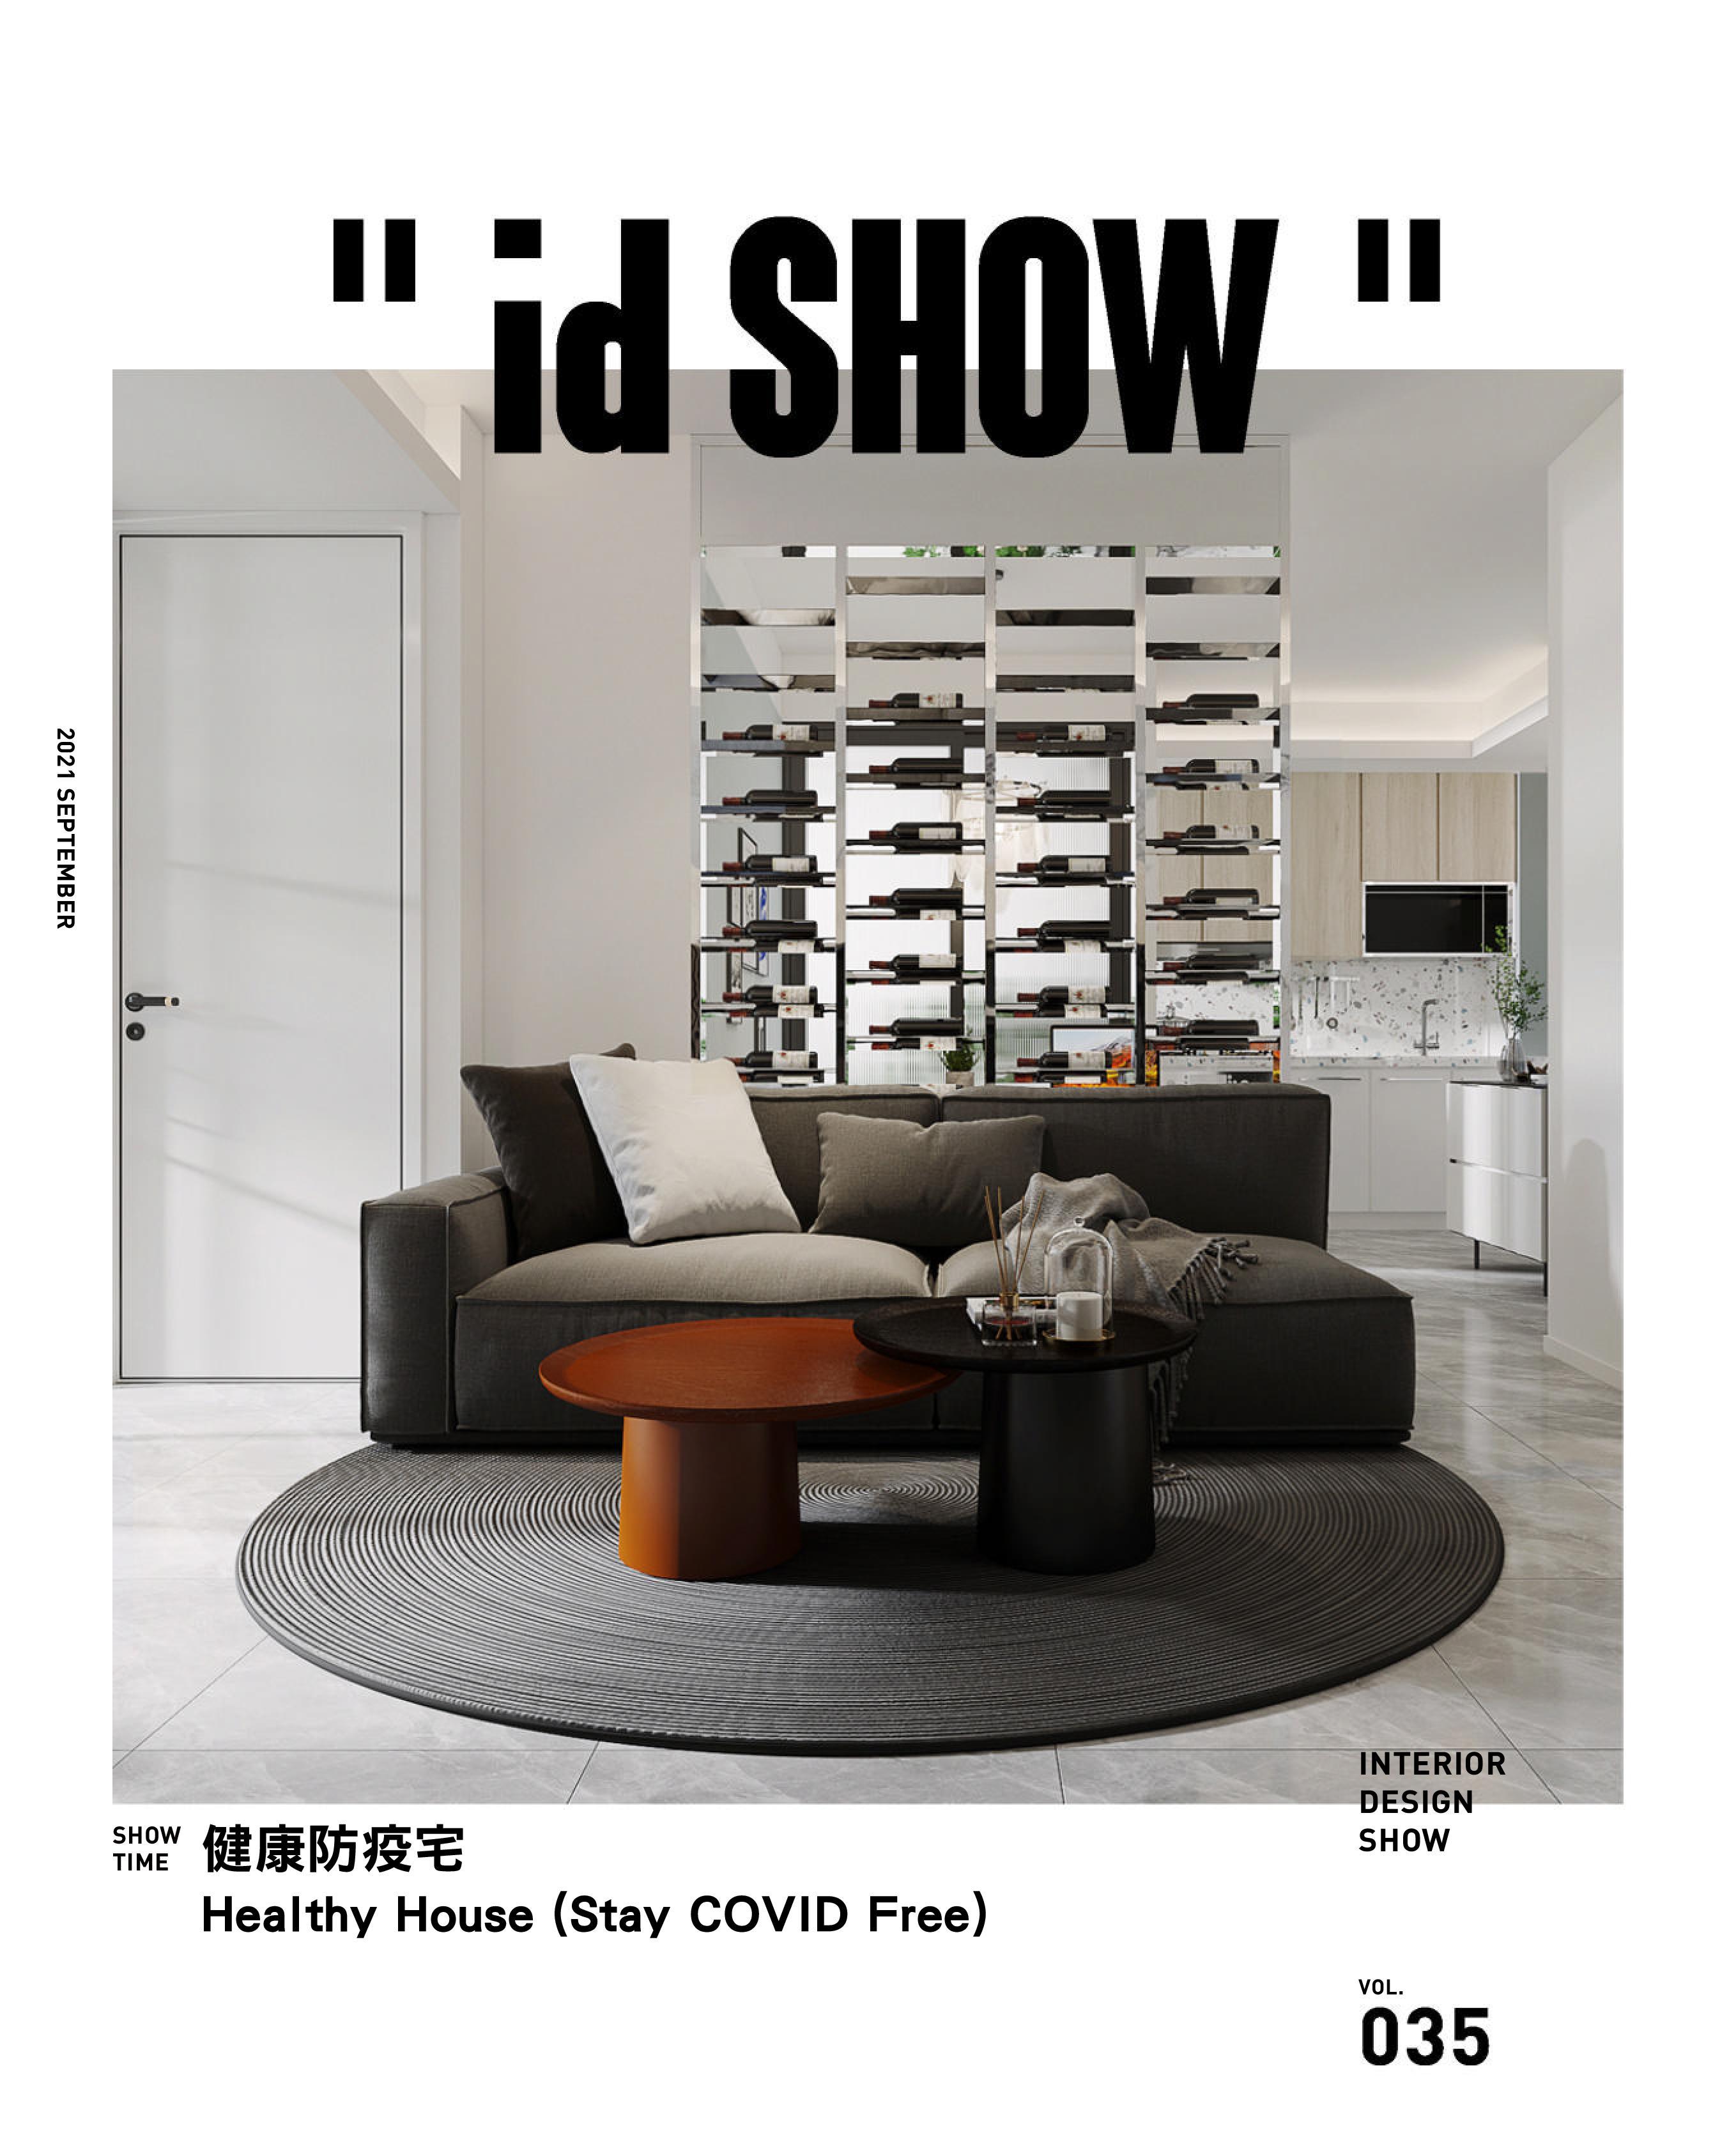 iDSHOW 好宅秀住宅影音誌 - 15 九月 2021